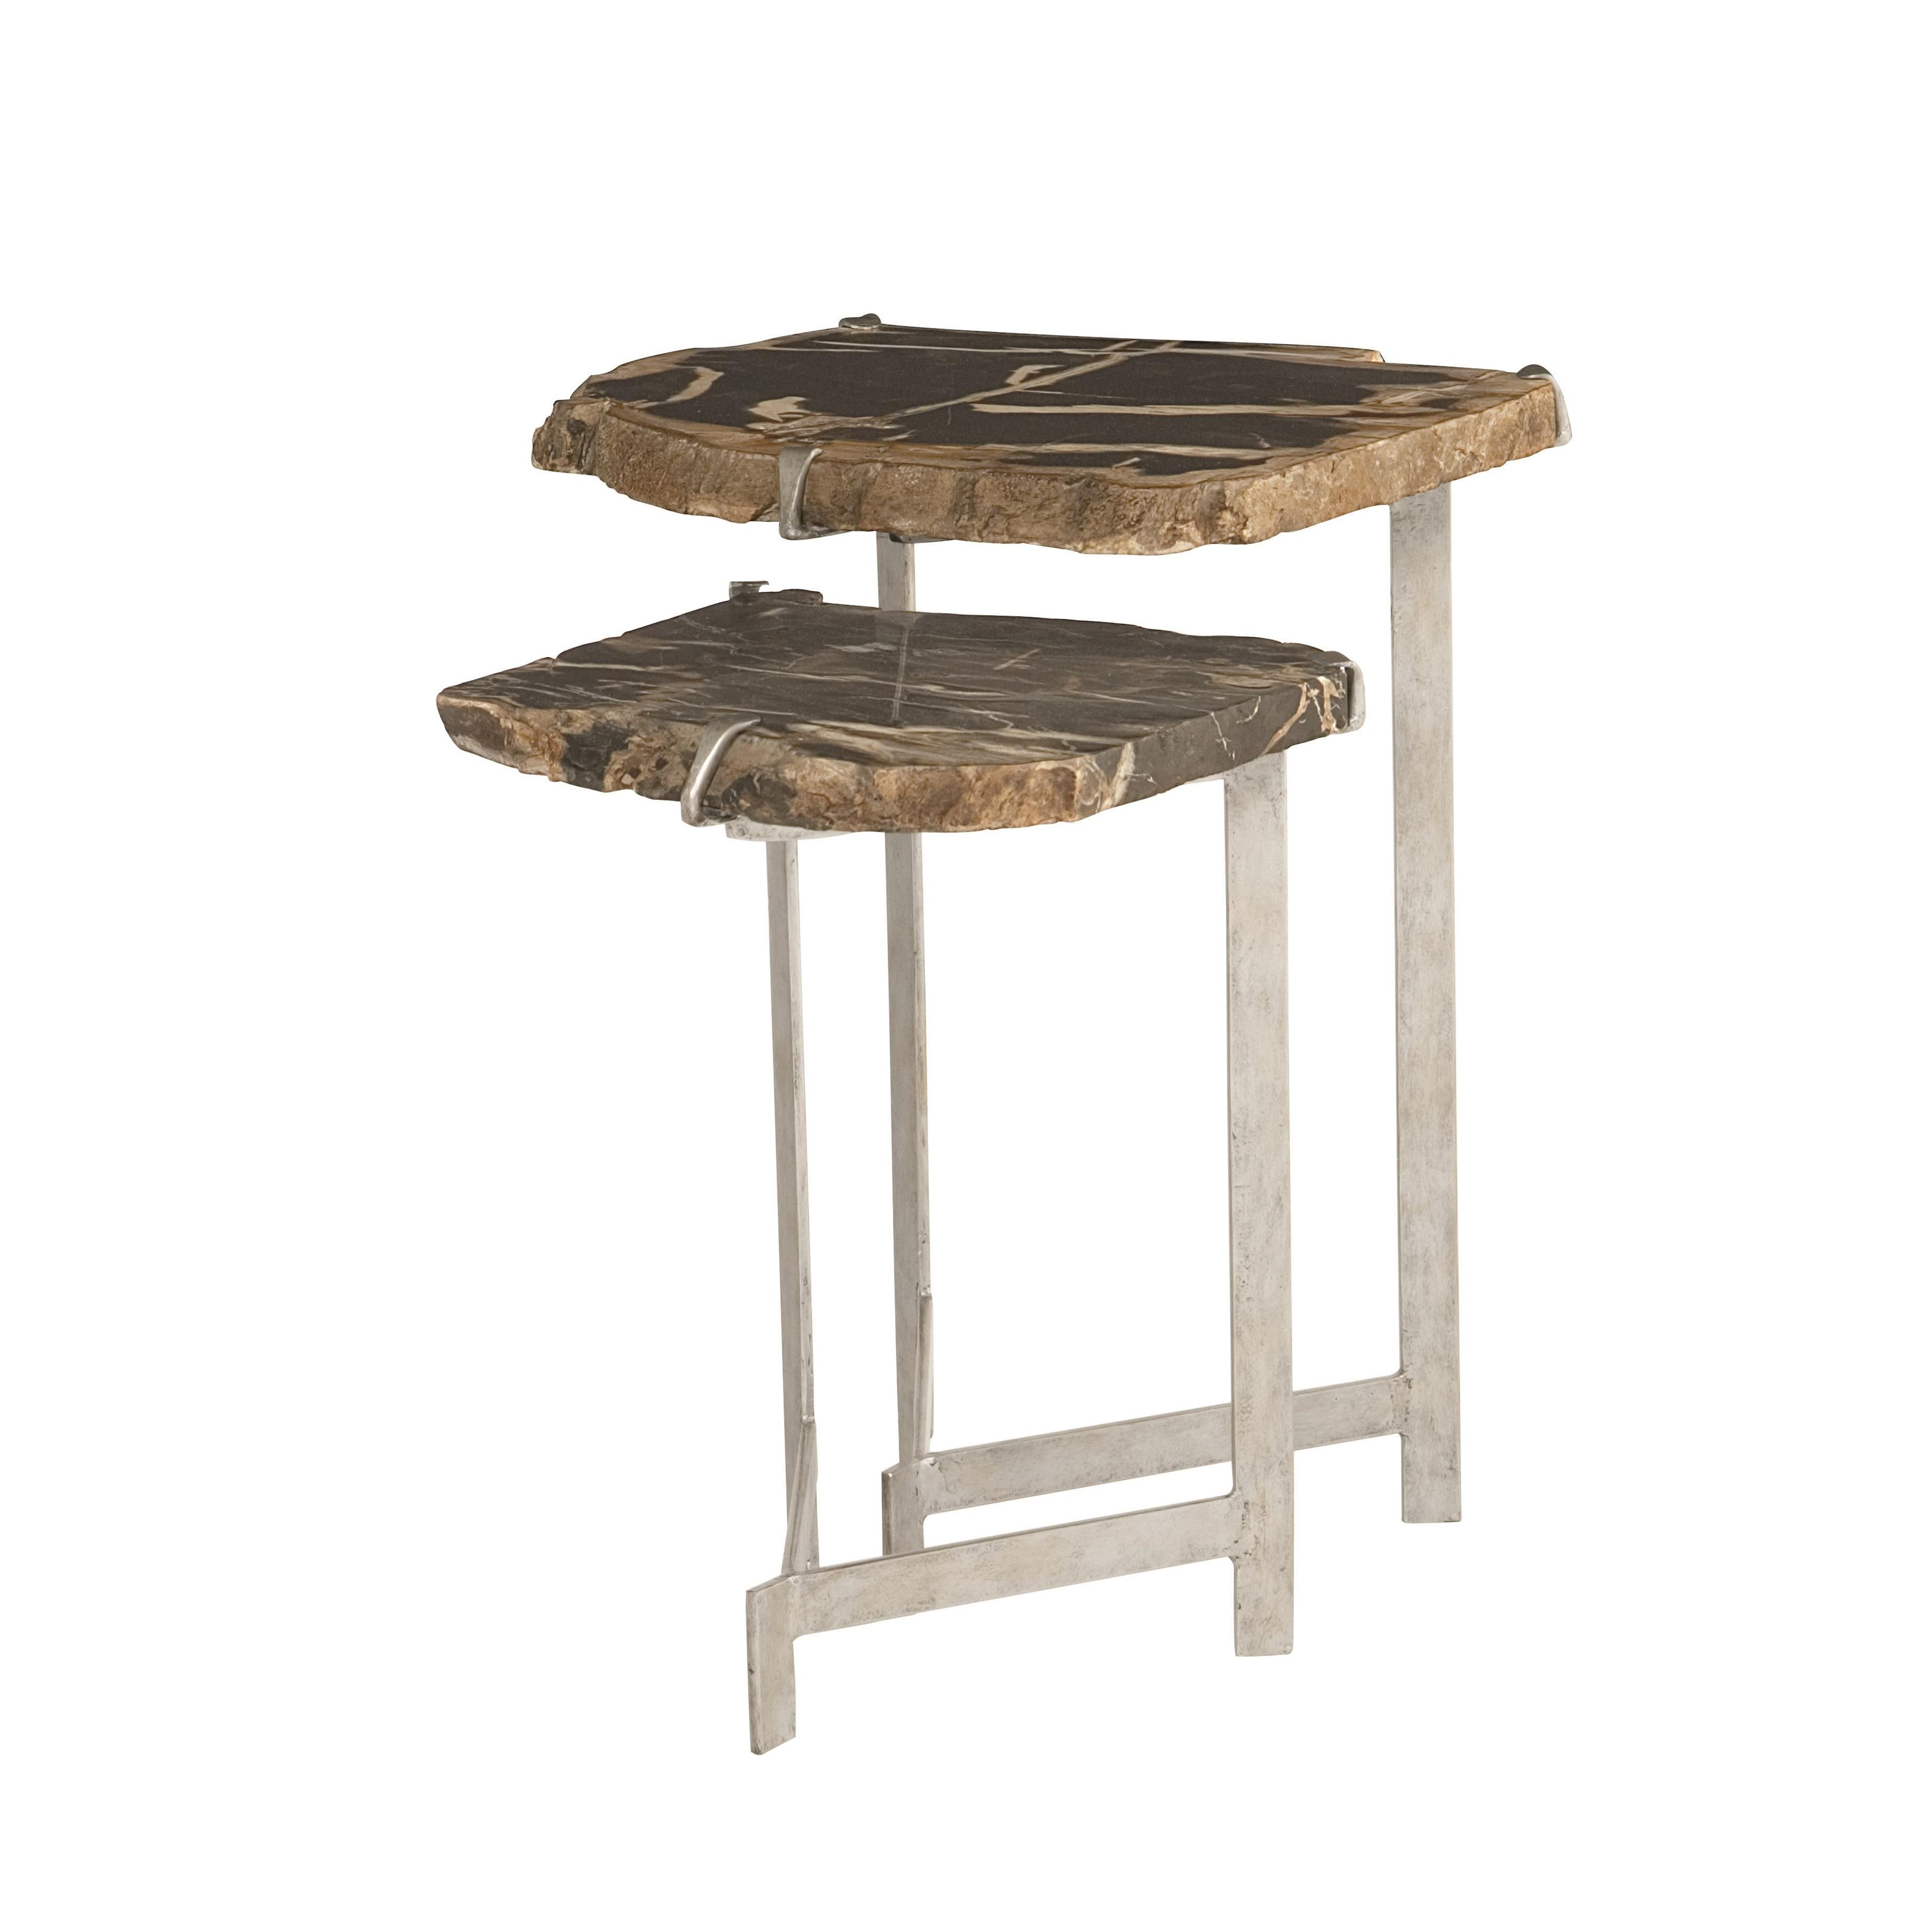 Ardelle Ardelle Nesting Table by Bernhardt at Morris Home